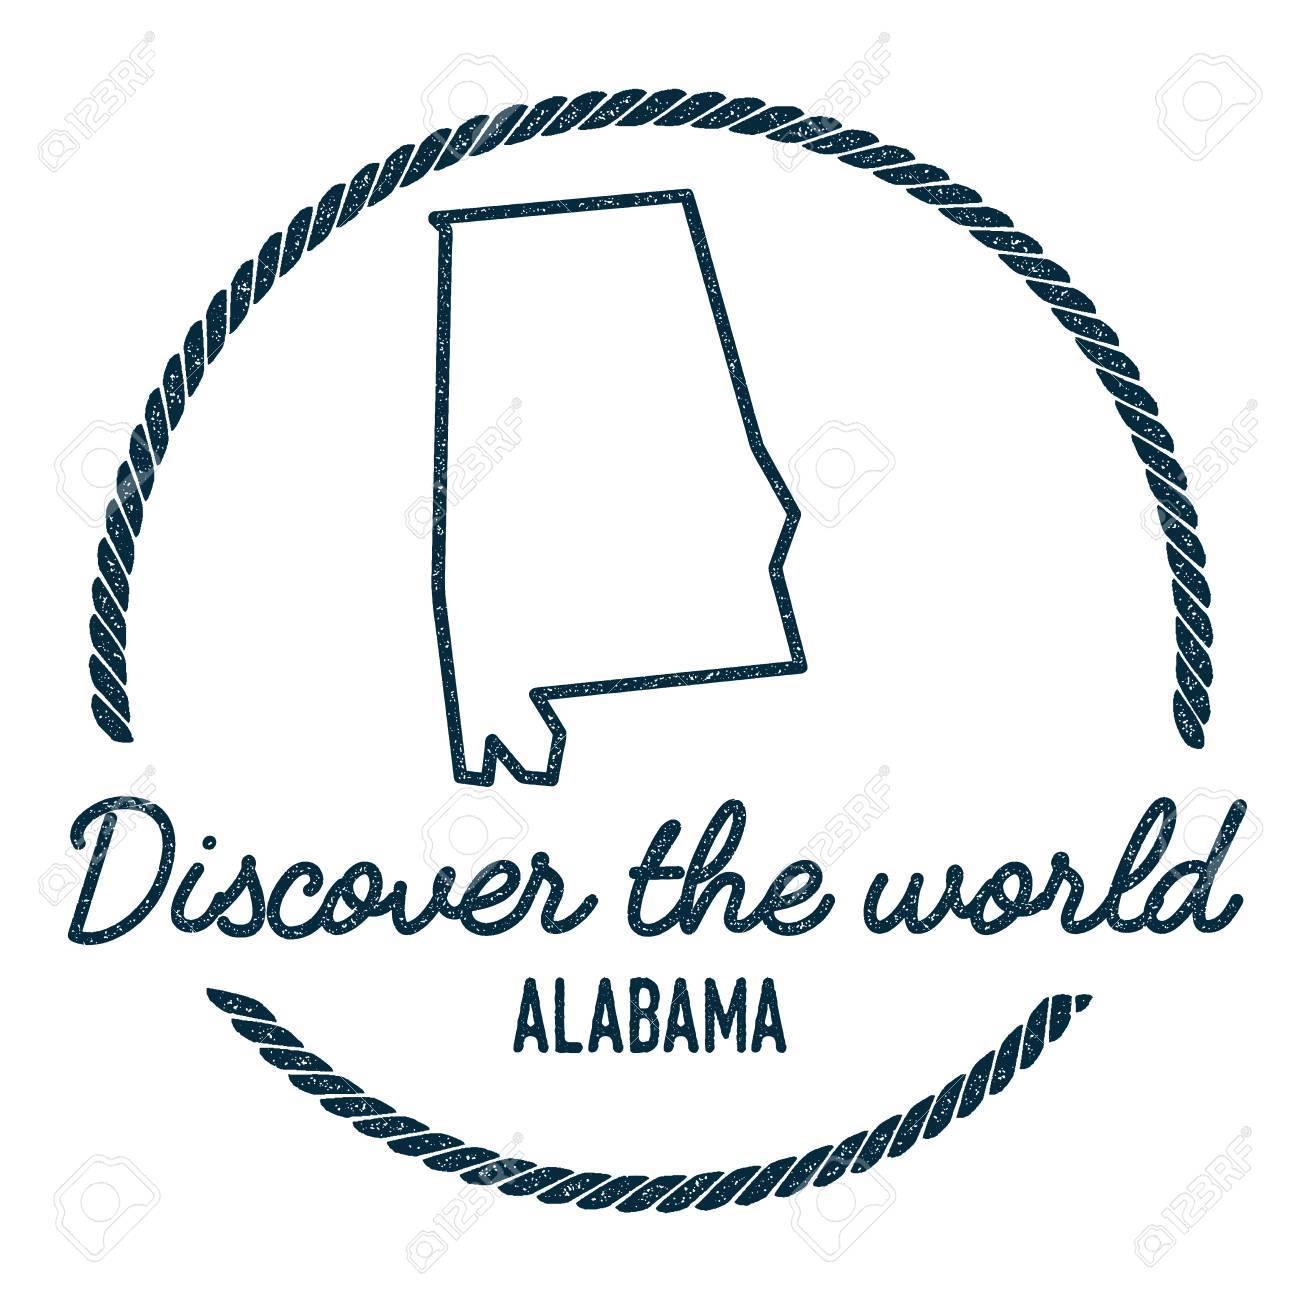 Alabama Map Outline Vintage Discover The World Rubber Stamp